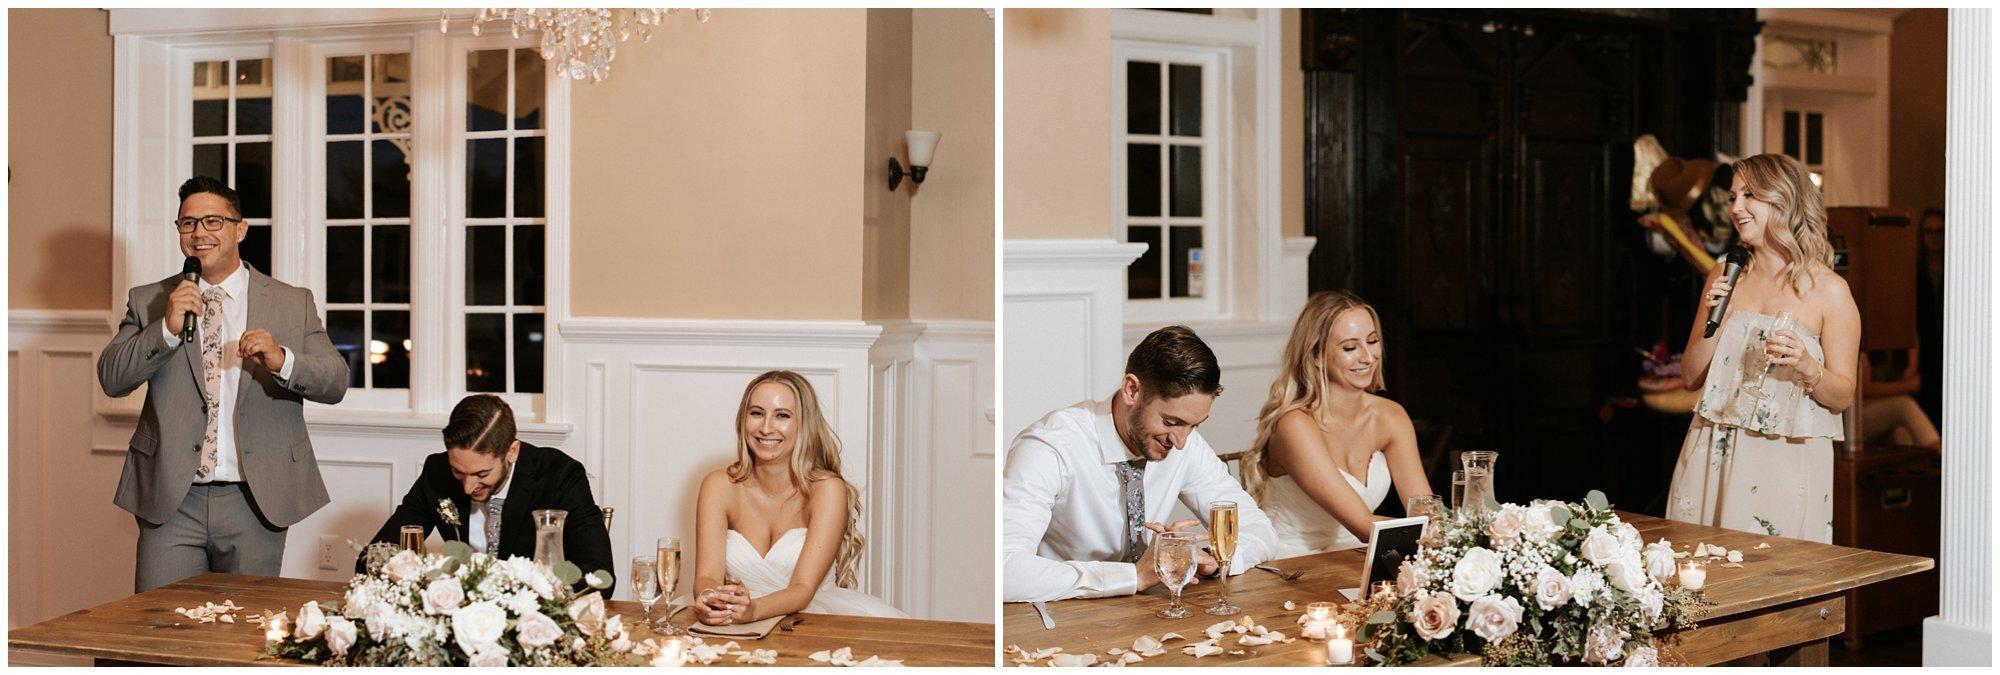 Wedgewood_Lindsay_Groves-Arizona-Wedding-Photographer-M+C_0067.jpg